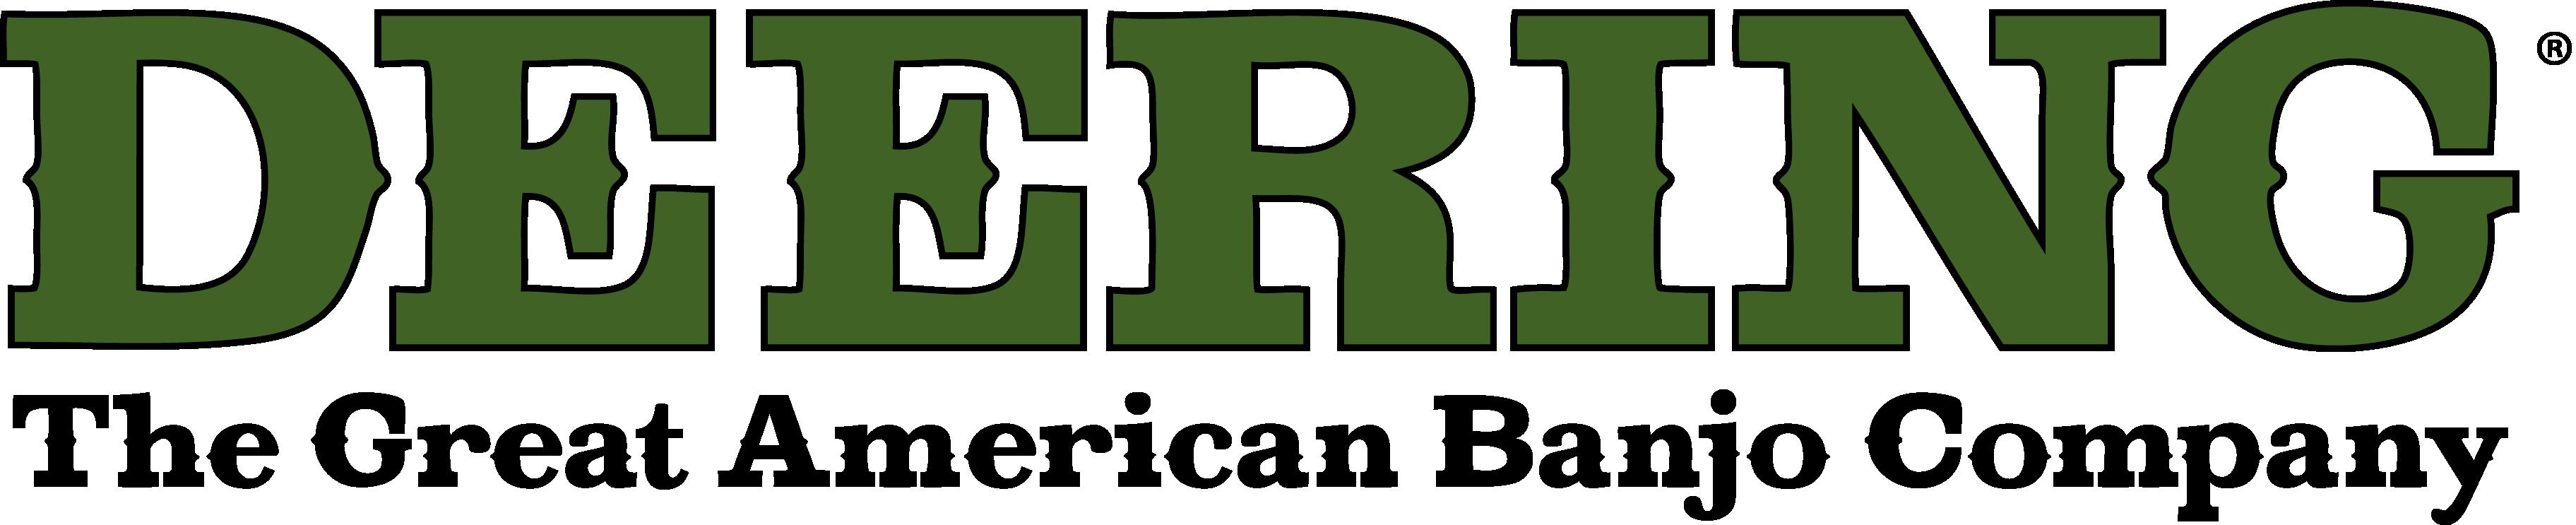 Deering Banjo Company logo